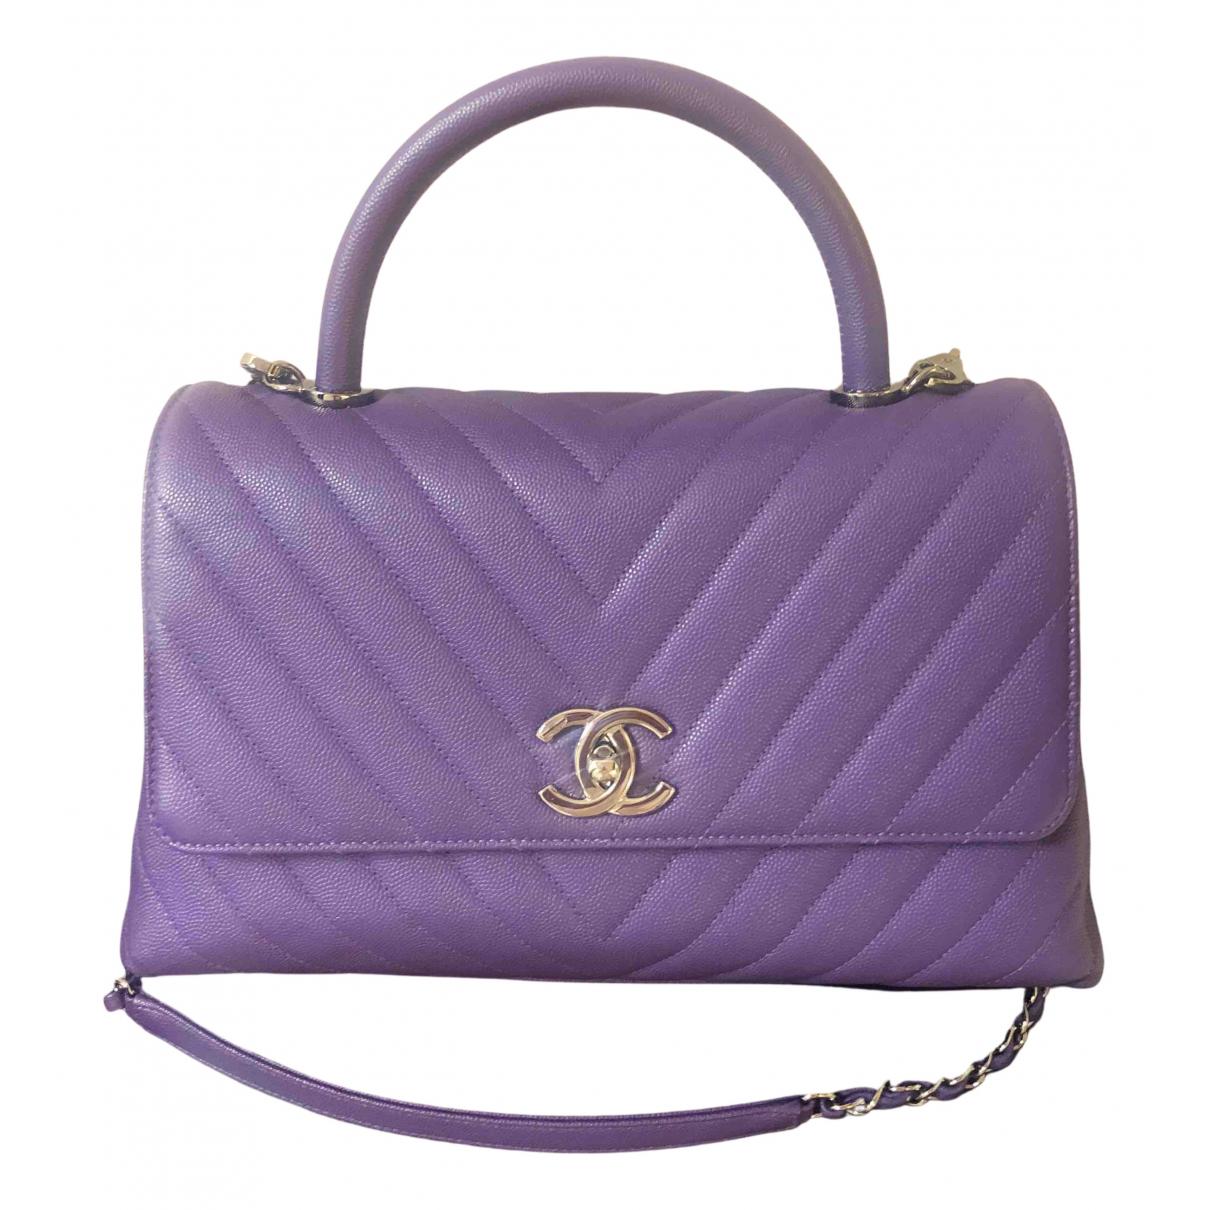 Chanel Coco Handle Handtasche in  Lila Leder